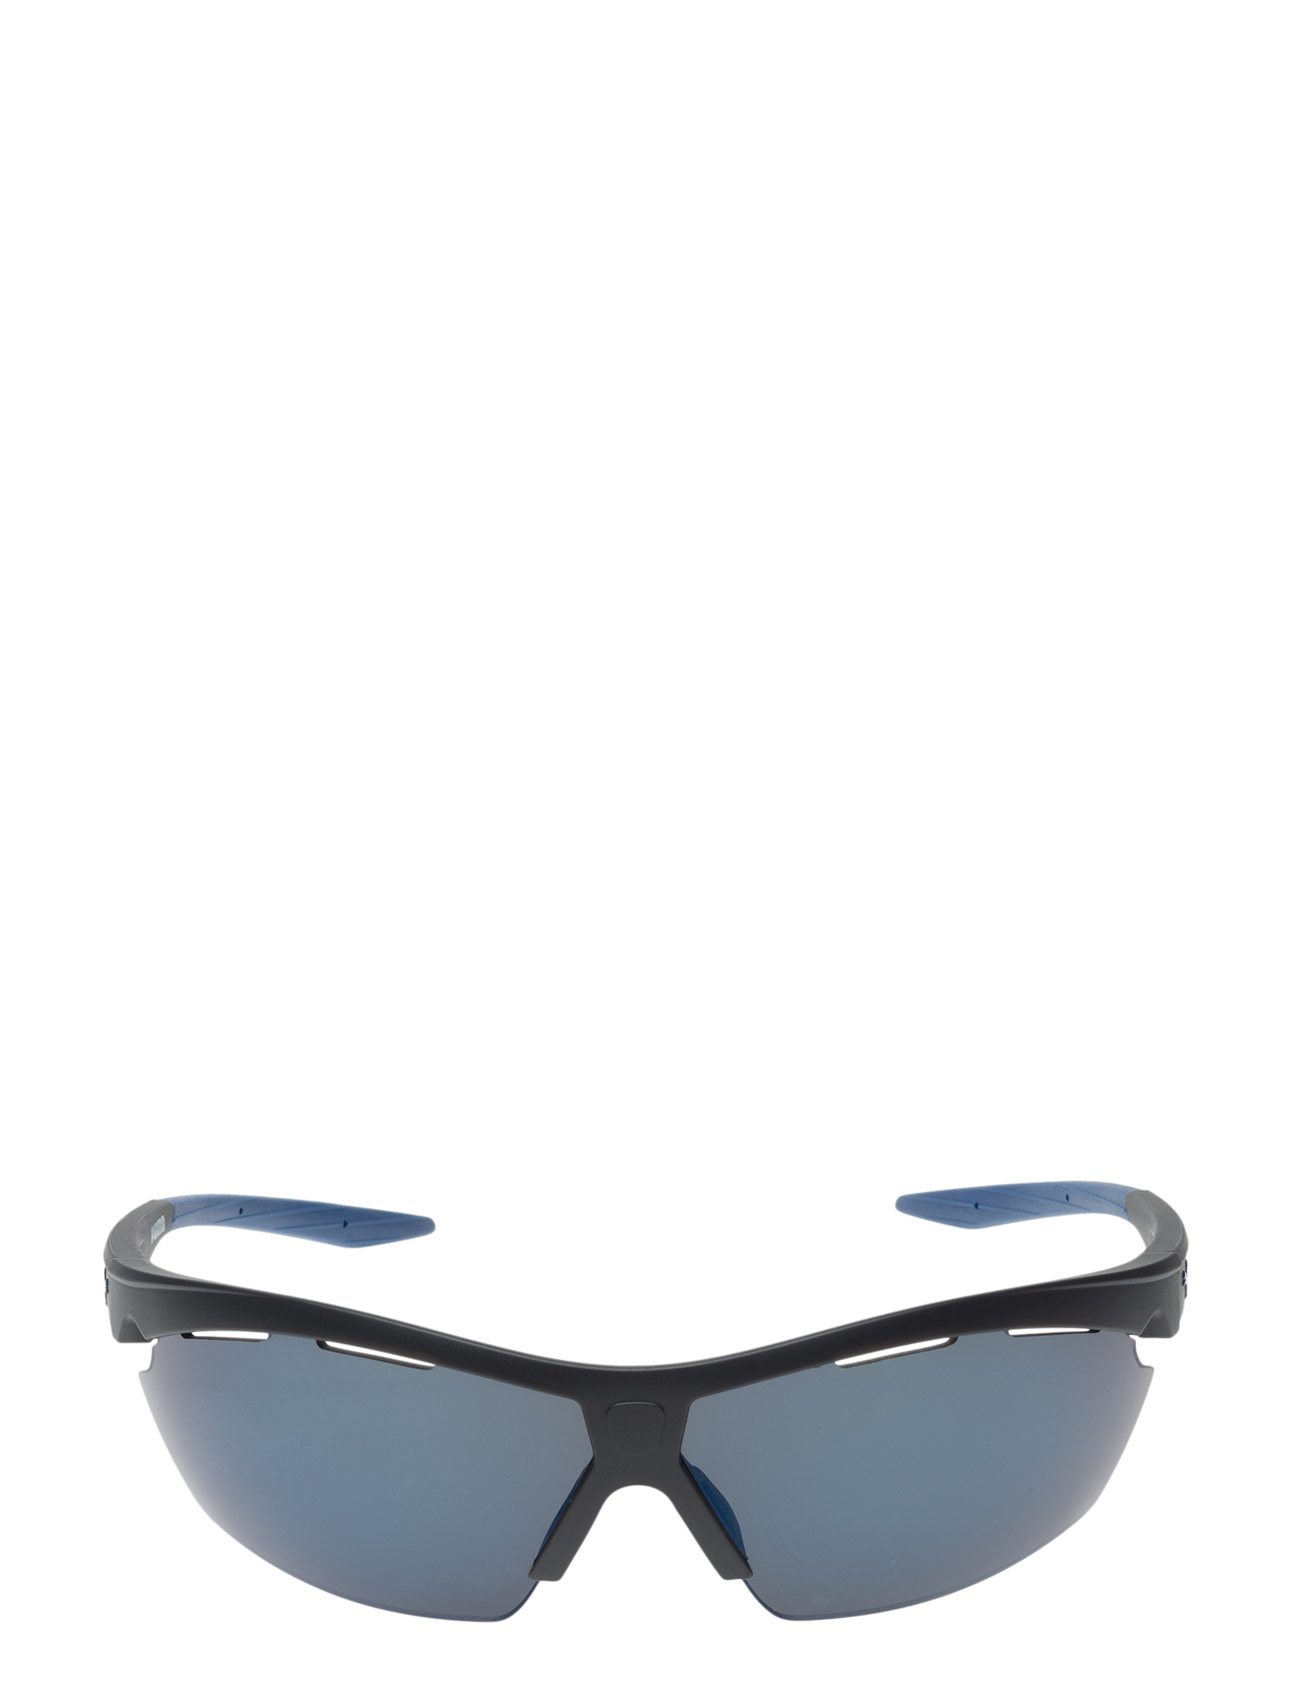 Pu0005s Puma Sports accessories til Herrer i